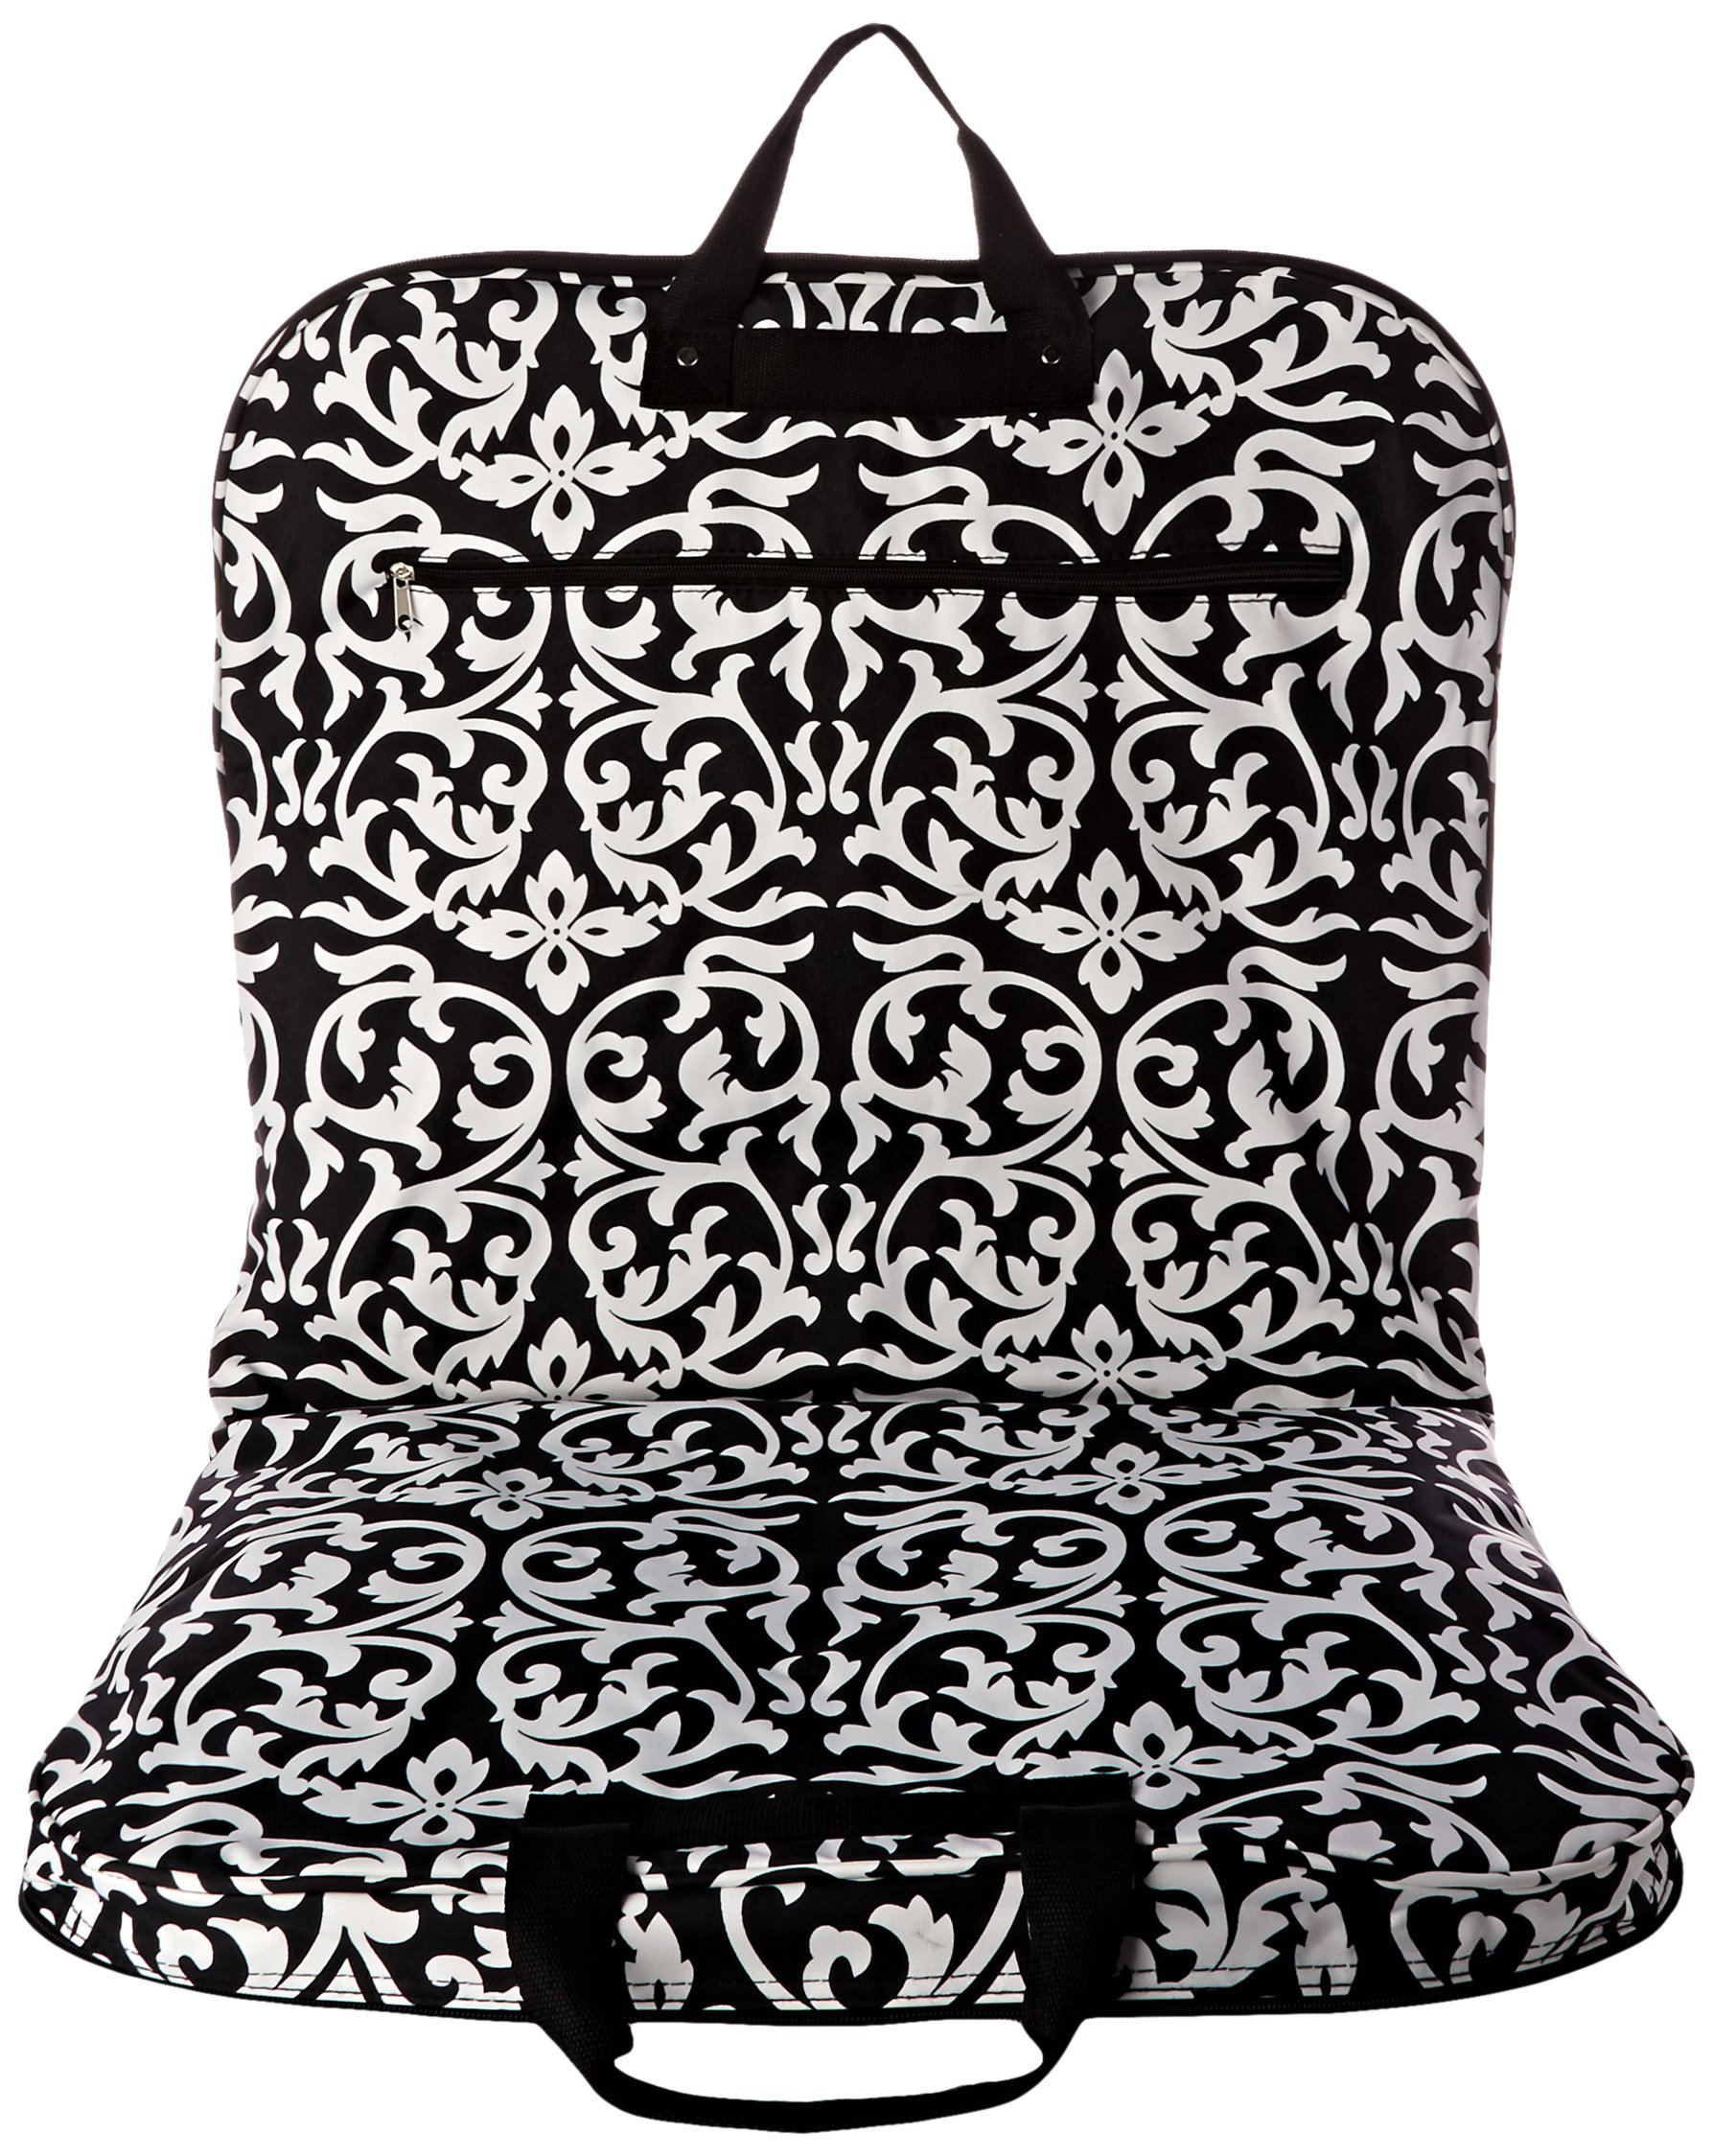 World Traveler 40 Inch Hanging Garment Bag, Black Trim Damask, One Size